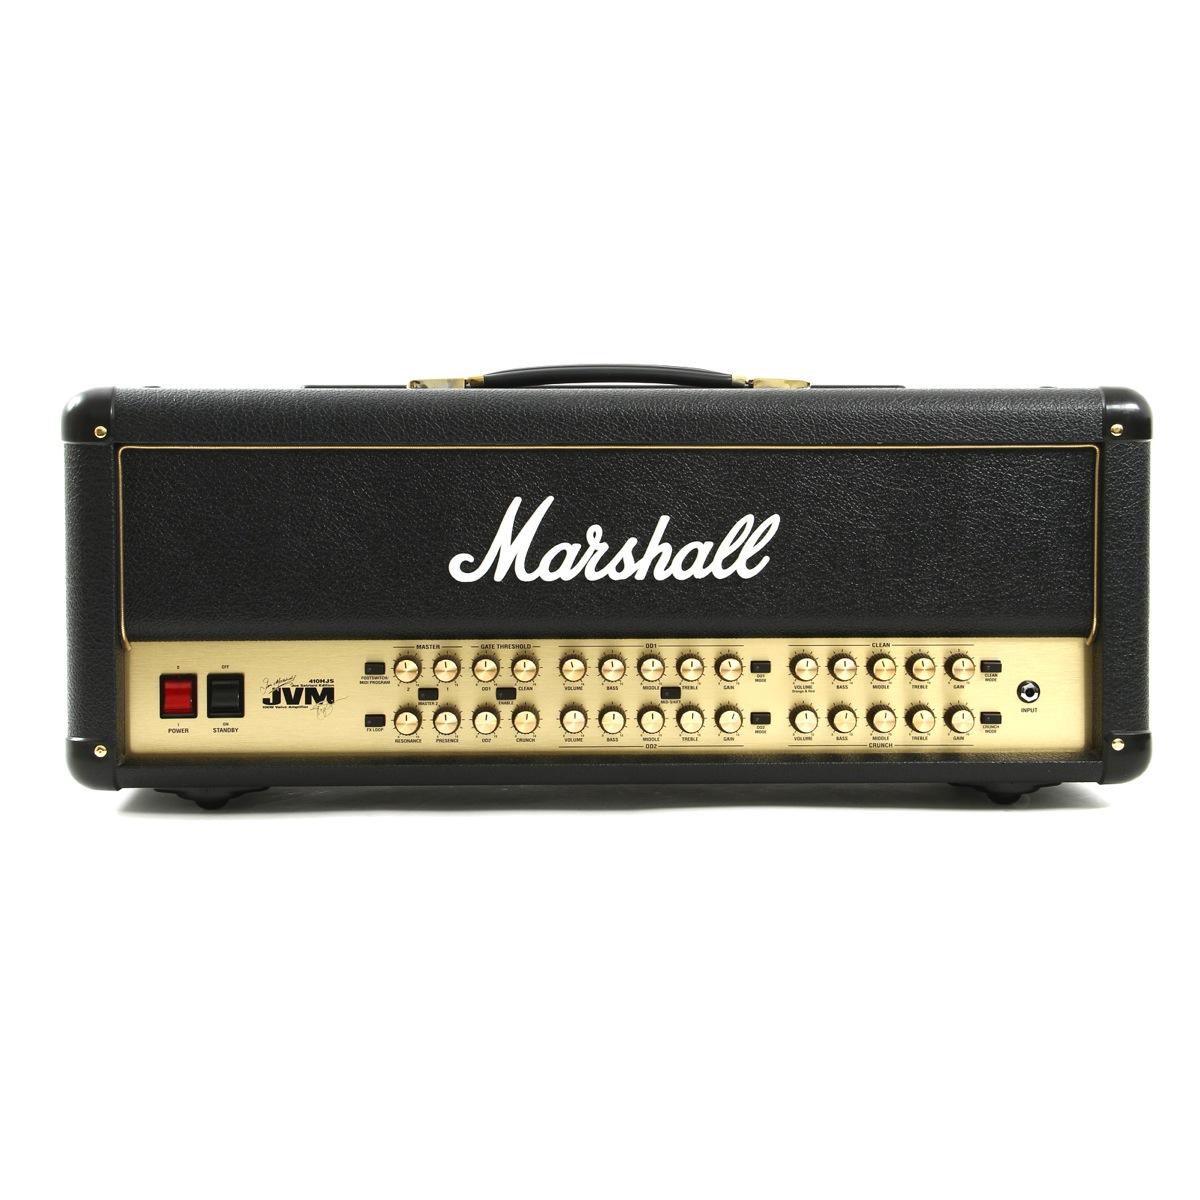 Marshall Jvm410hjs 100w Guitar Amplifier Head